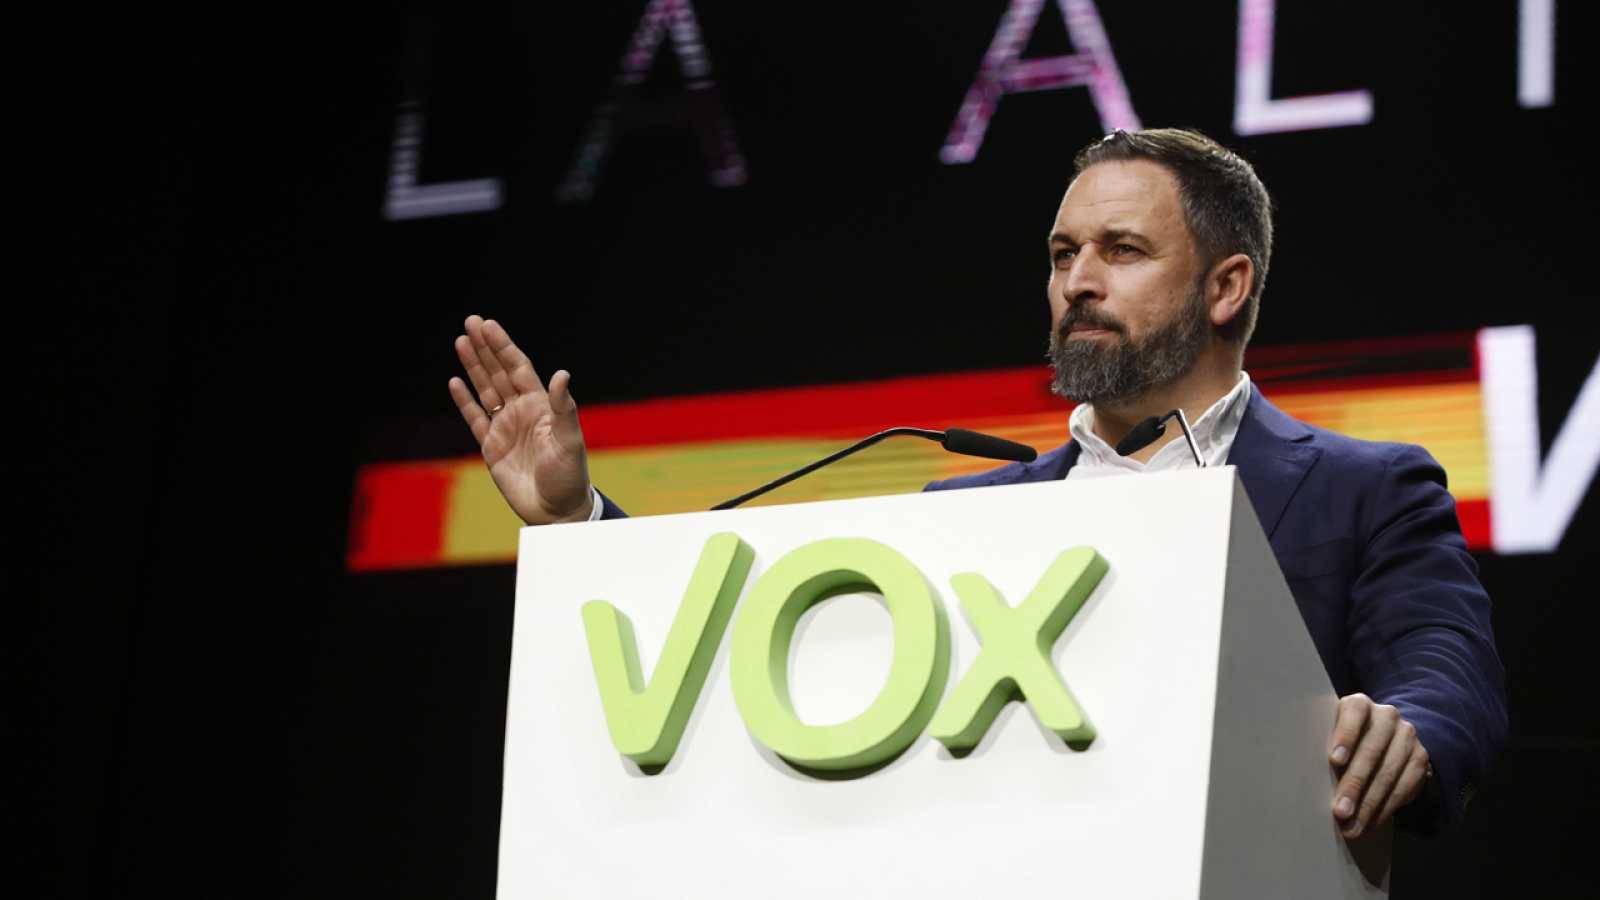 El líder de Vox, Santiago Abascal, durante la asamblea general de Vox el 8 de marzo